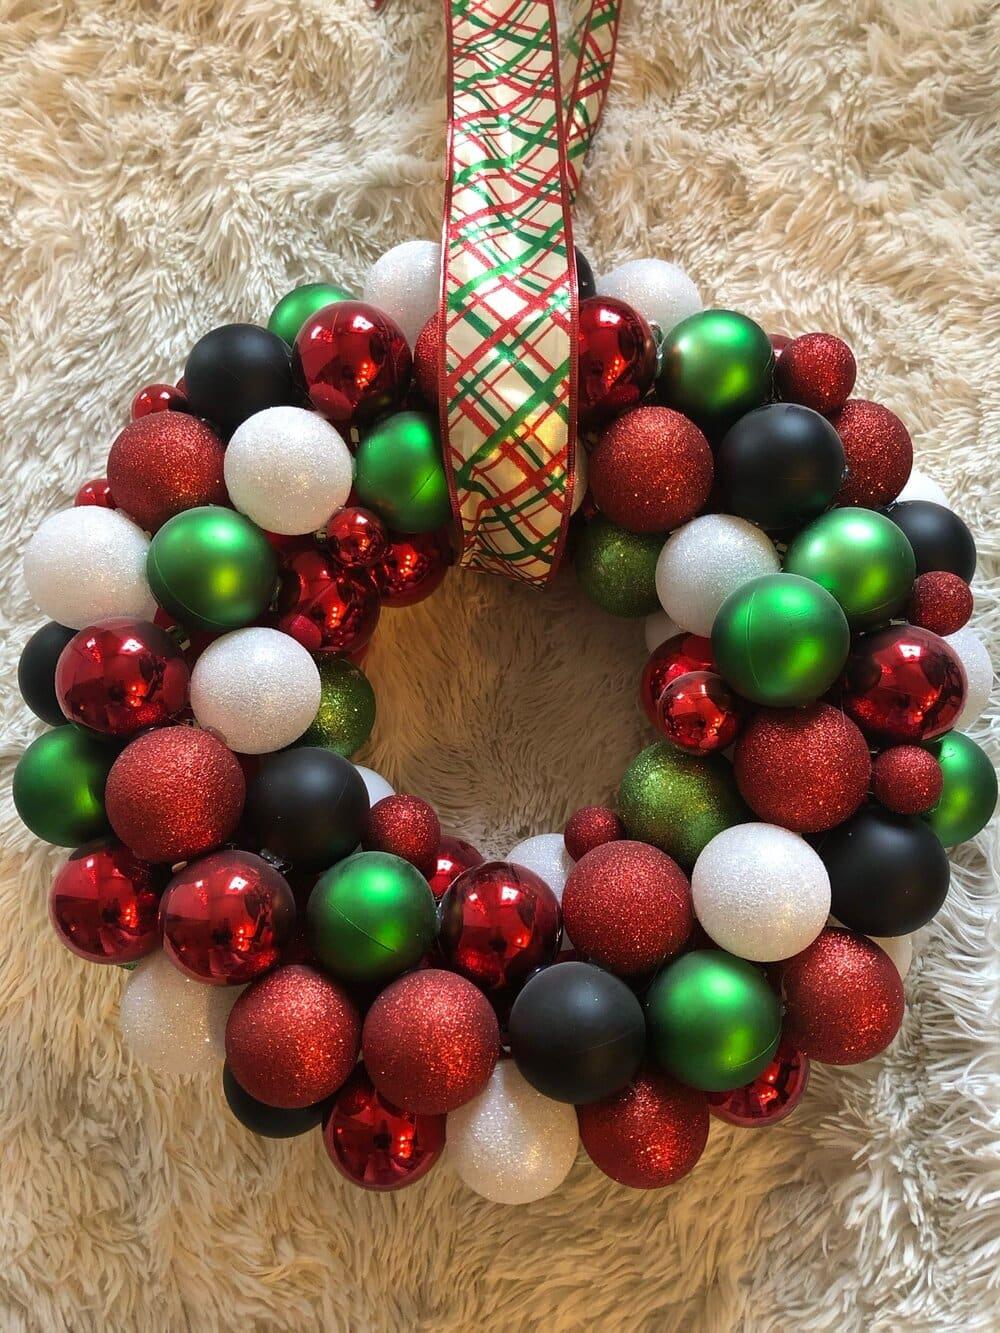 Missouri girl Christmas wreath. Missouri girl. Missouri girl blog. #christmaswreath #christmasdecor #diychristmasdecor #Missourigirl